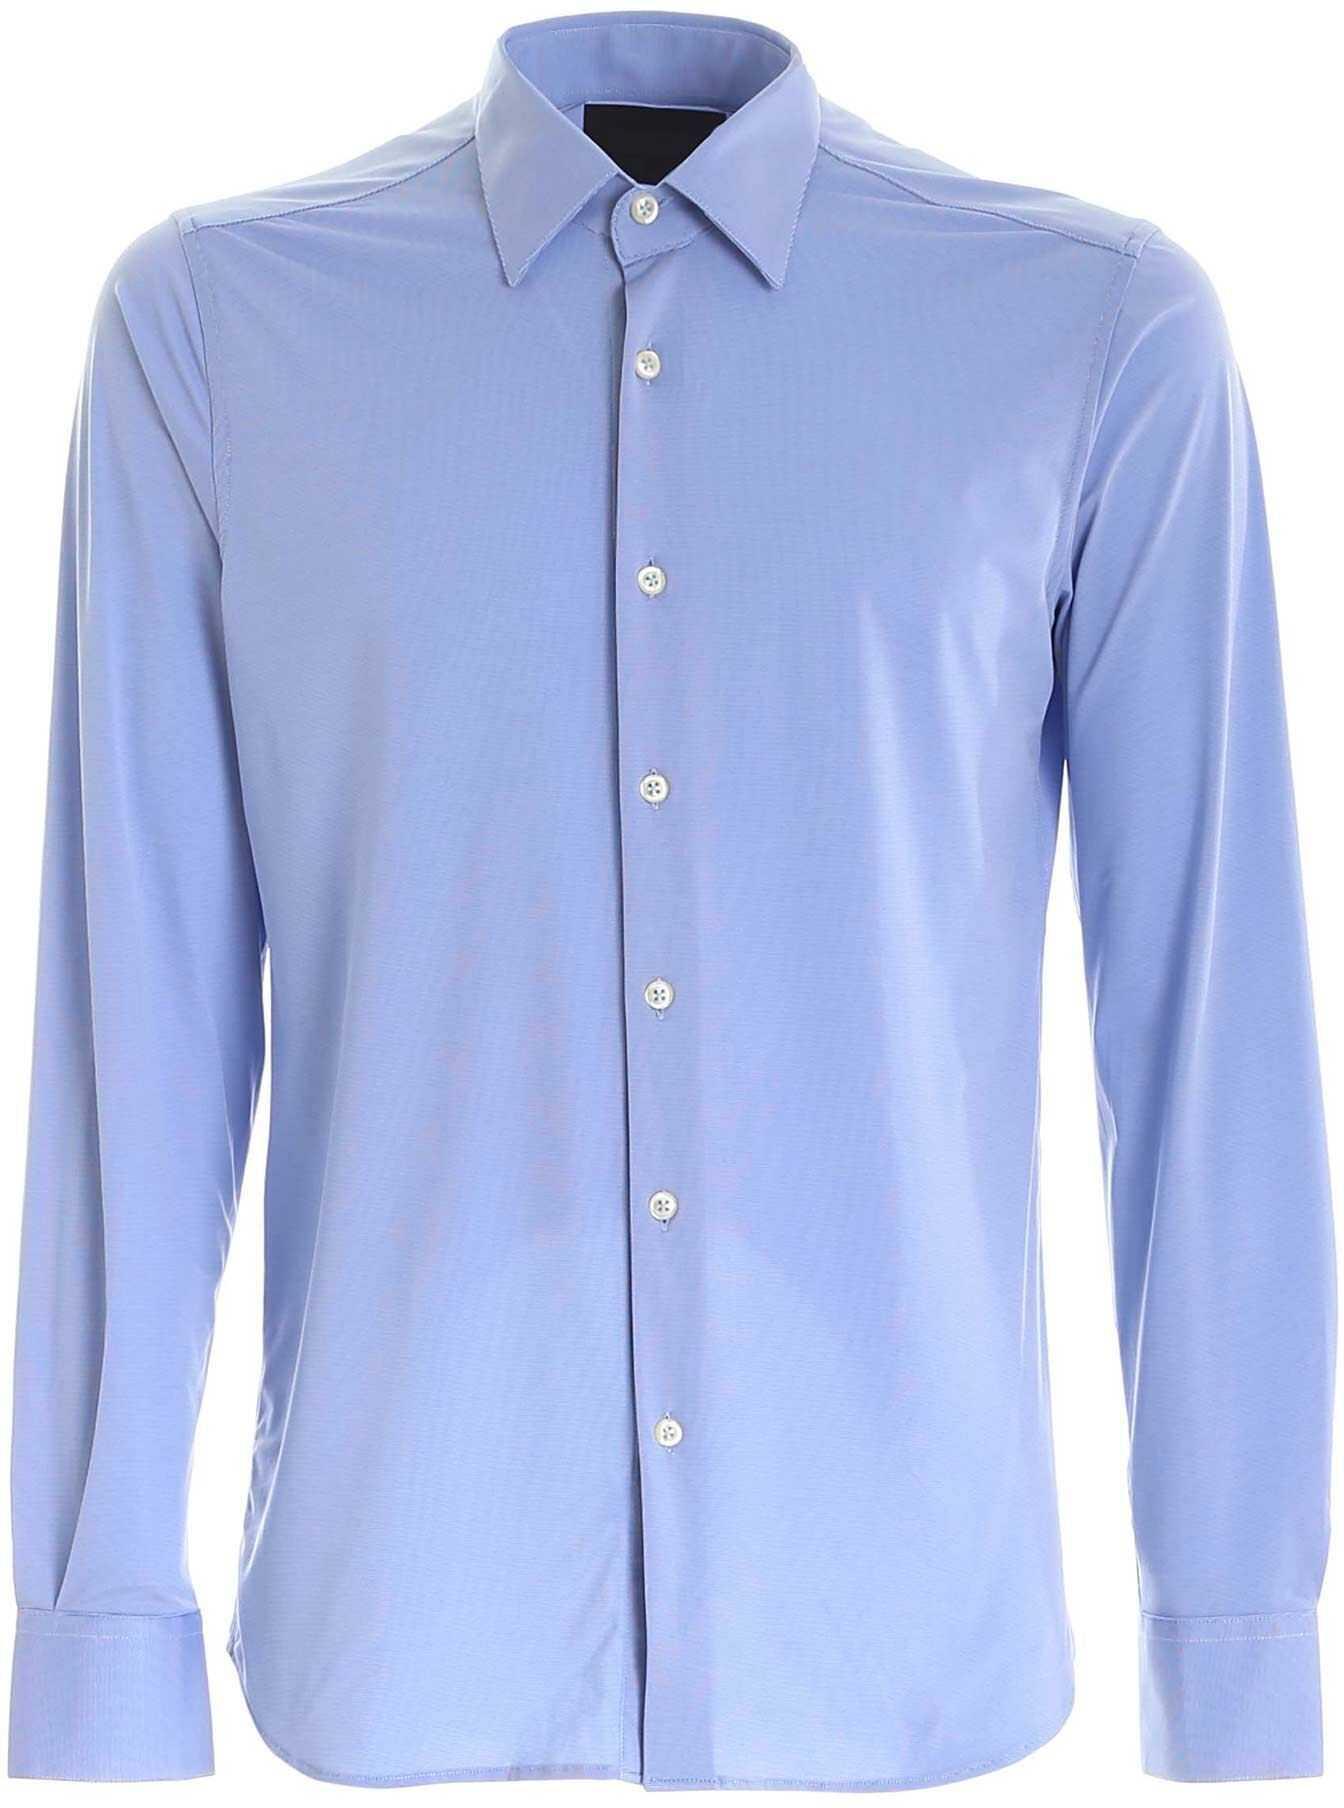 RRD Roberto Ricci Designs Oxford Shirt In Light Blue Light Blue imagine